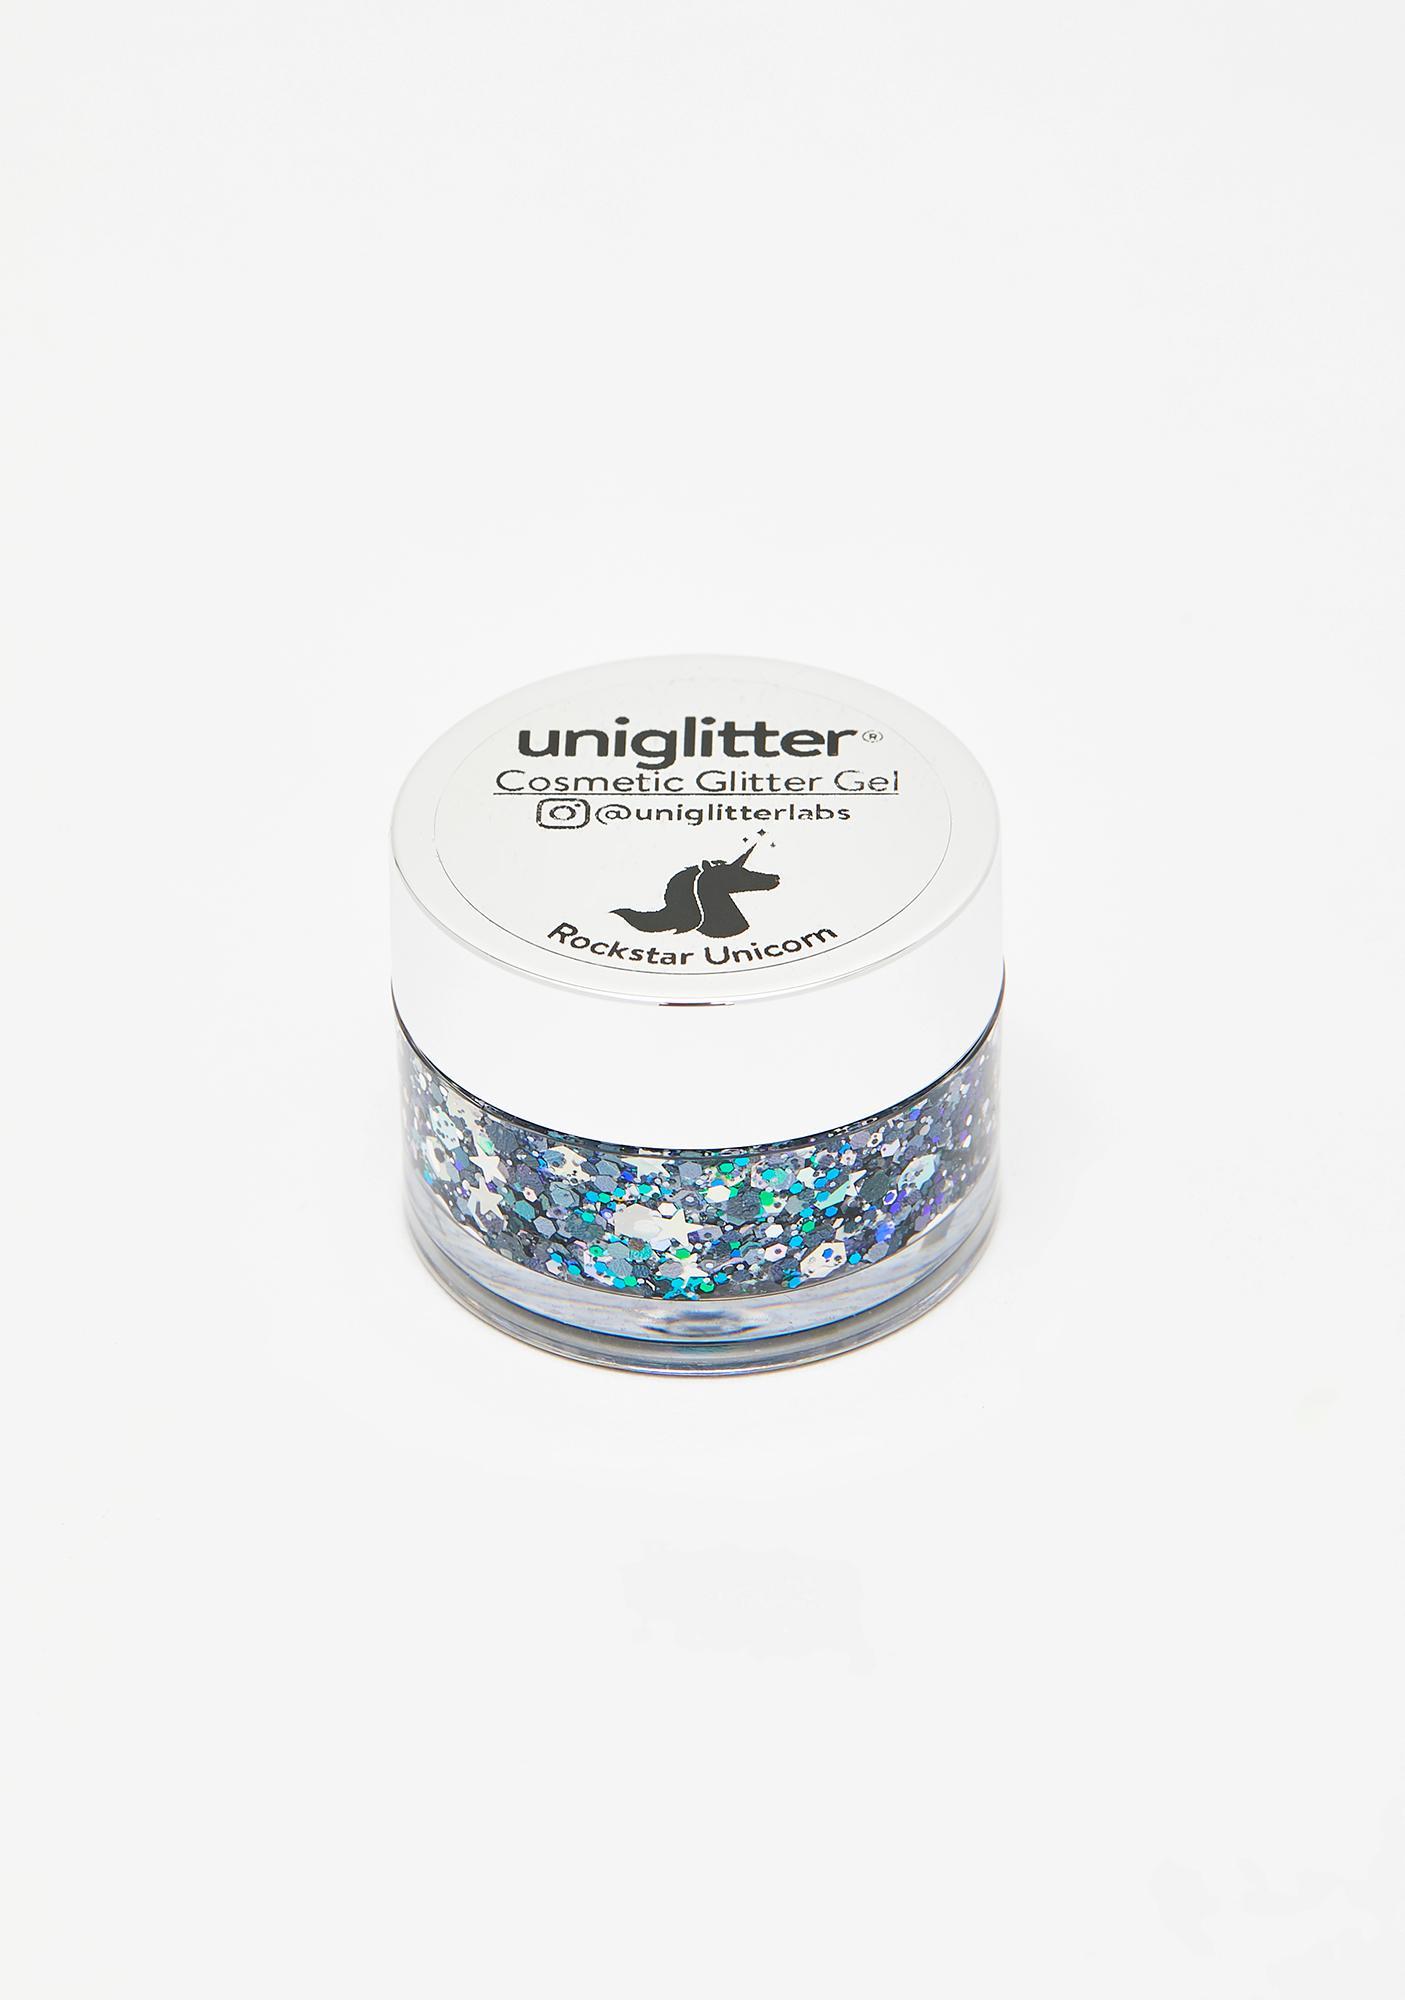 Uniglitter Rockstar Unicorn Glitter Gel